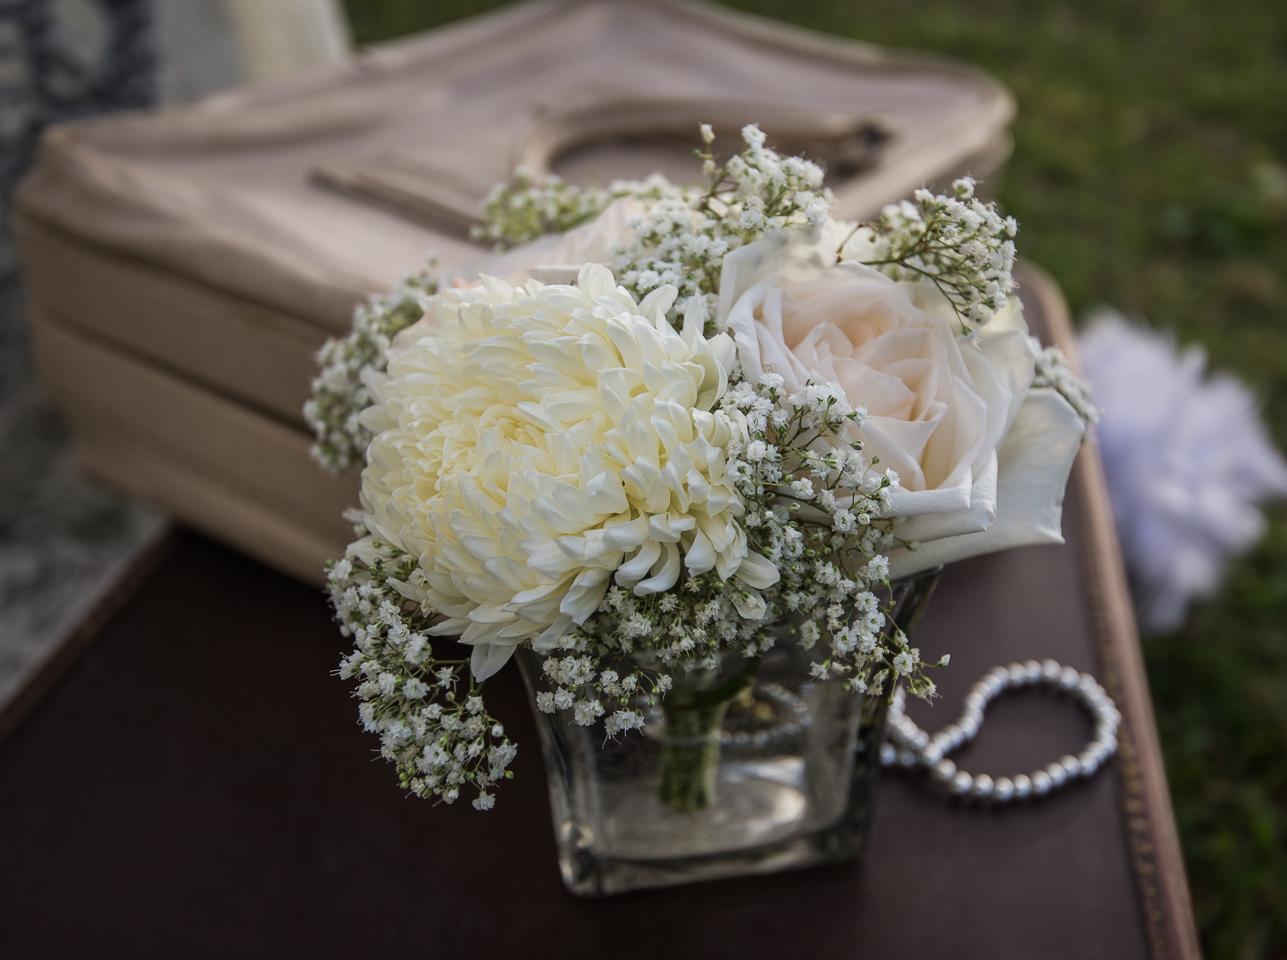 bodas-vintage-gran-gatsby-cuba-10562.jpg